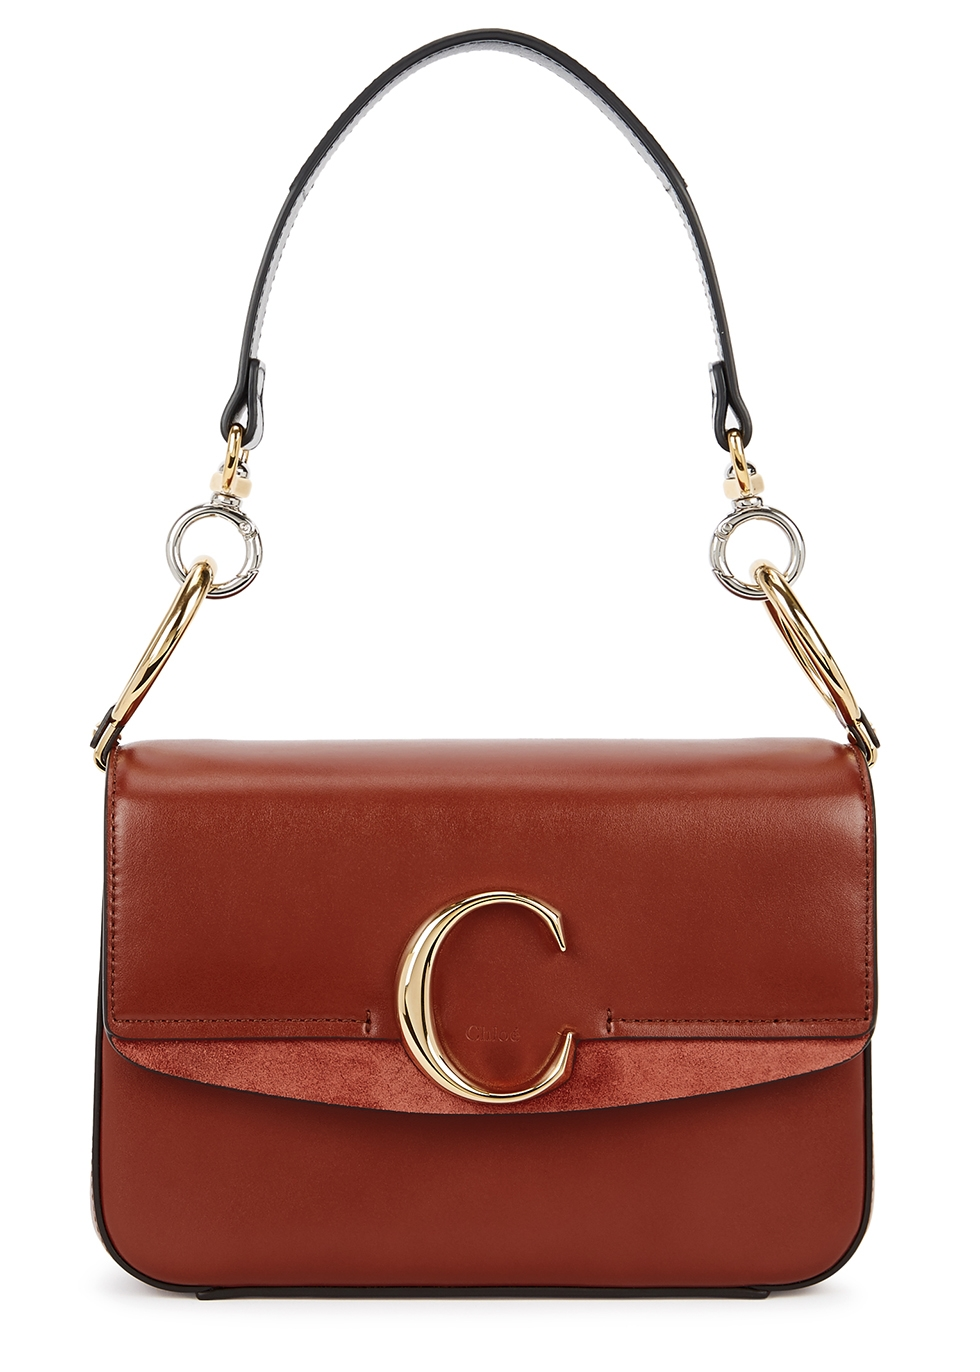 CHLOÉ   Chloé Chloé C Small Leather Shoulder Bag   Goxip